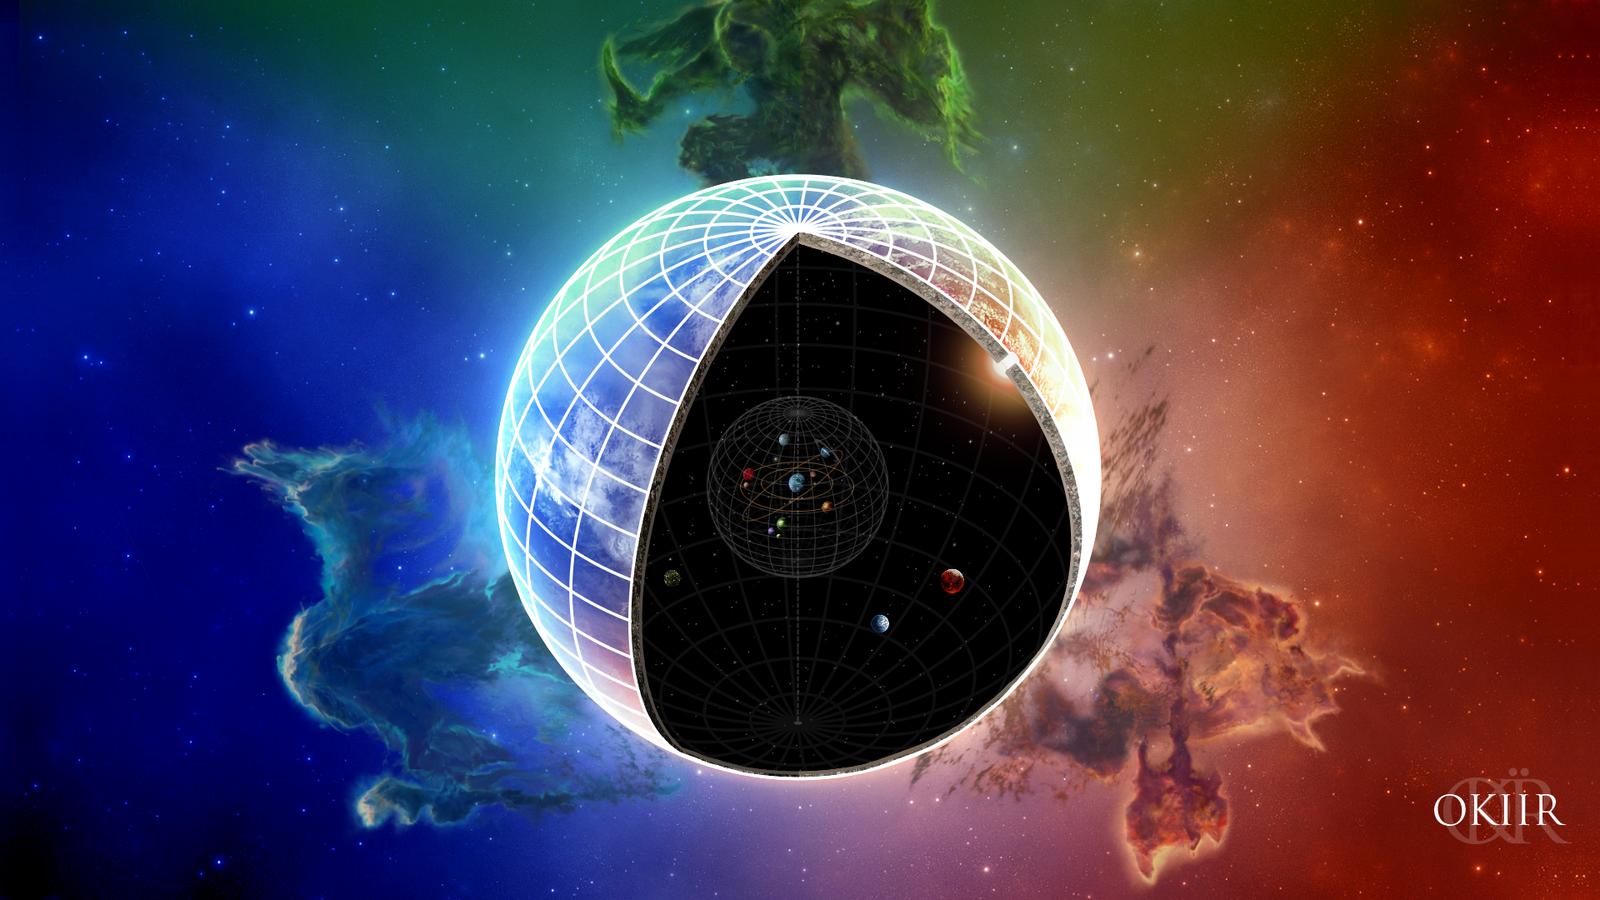 Best 51 Cosmologist Wallpaper on HipWallpaper Cosmologist 1600x900